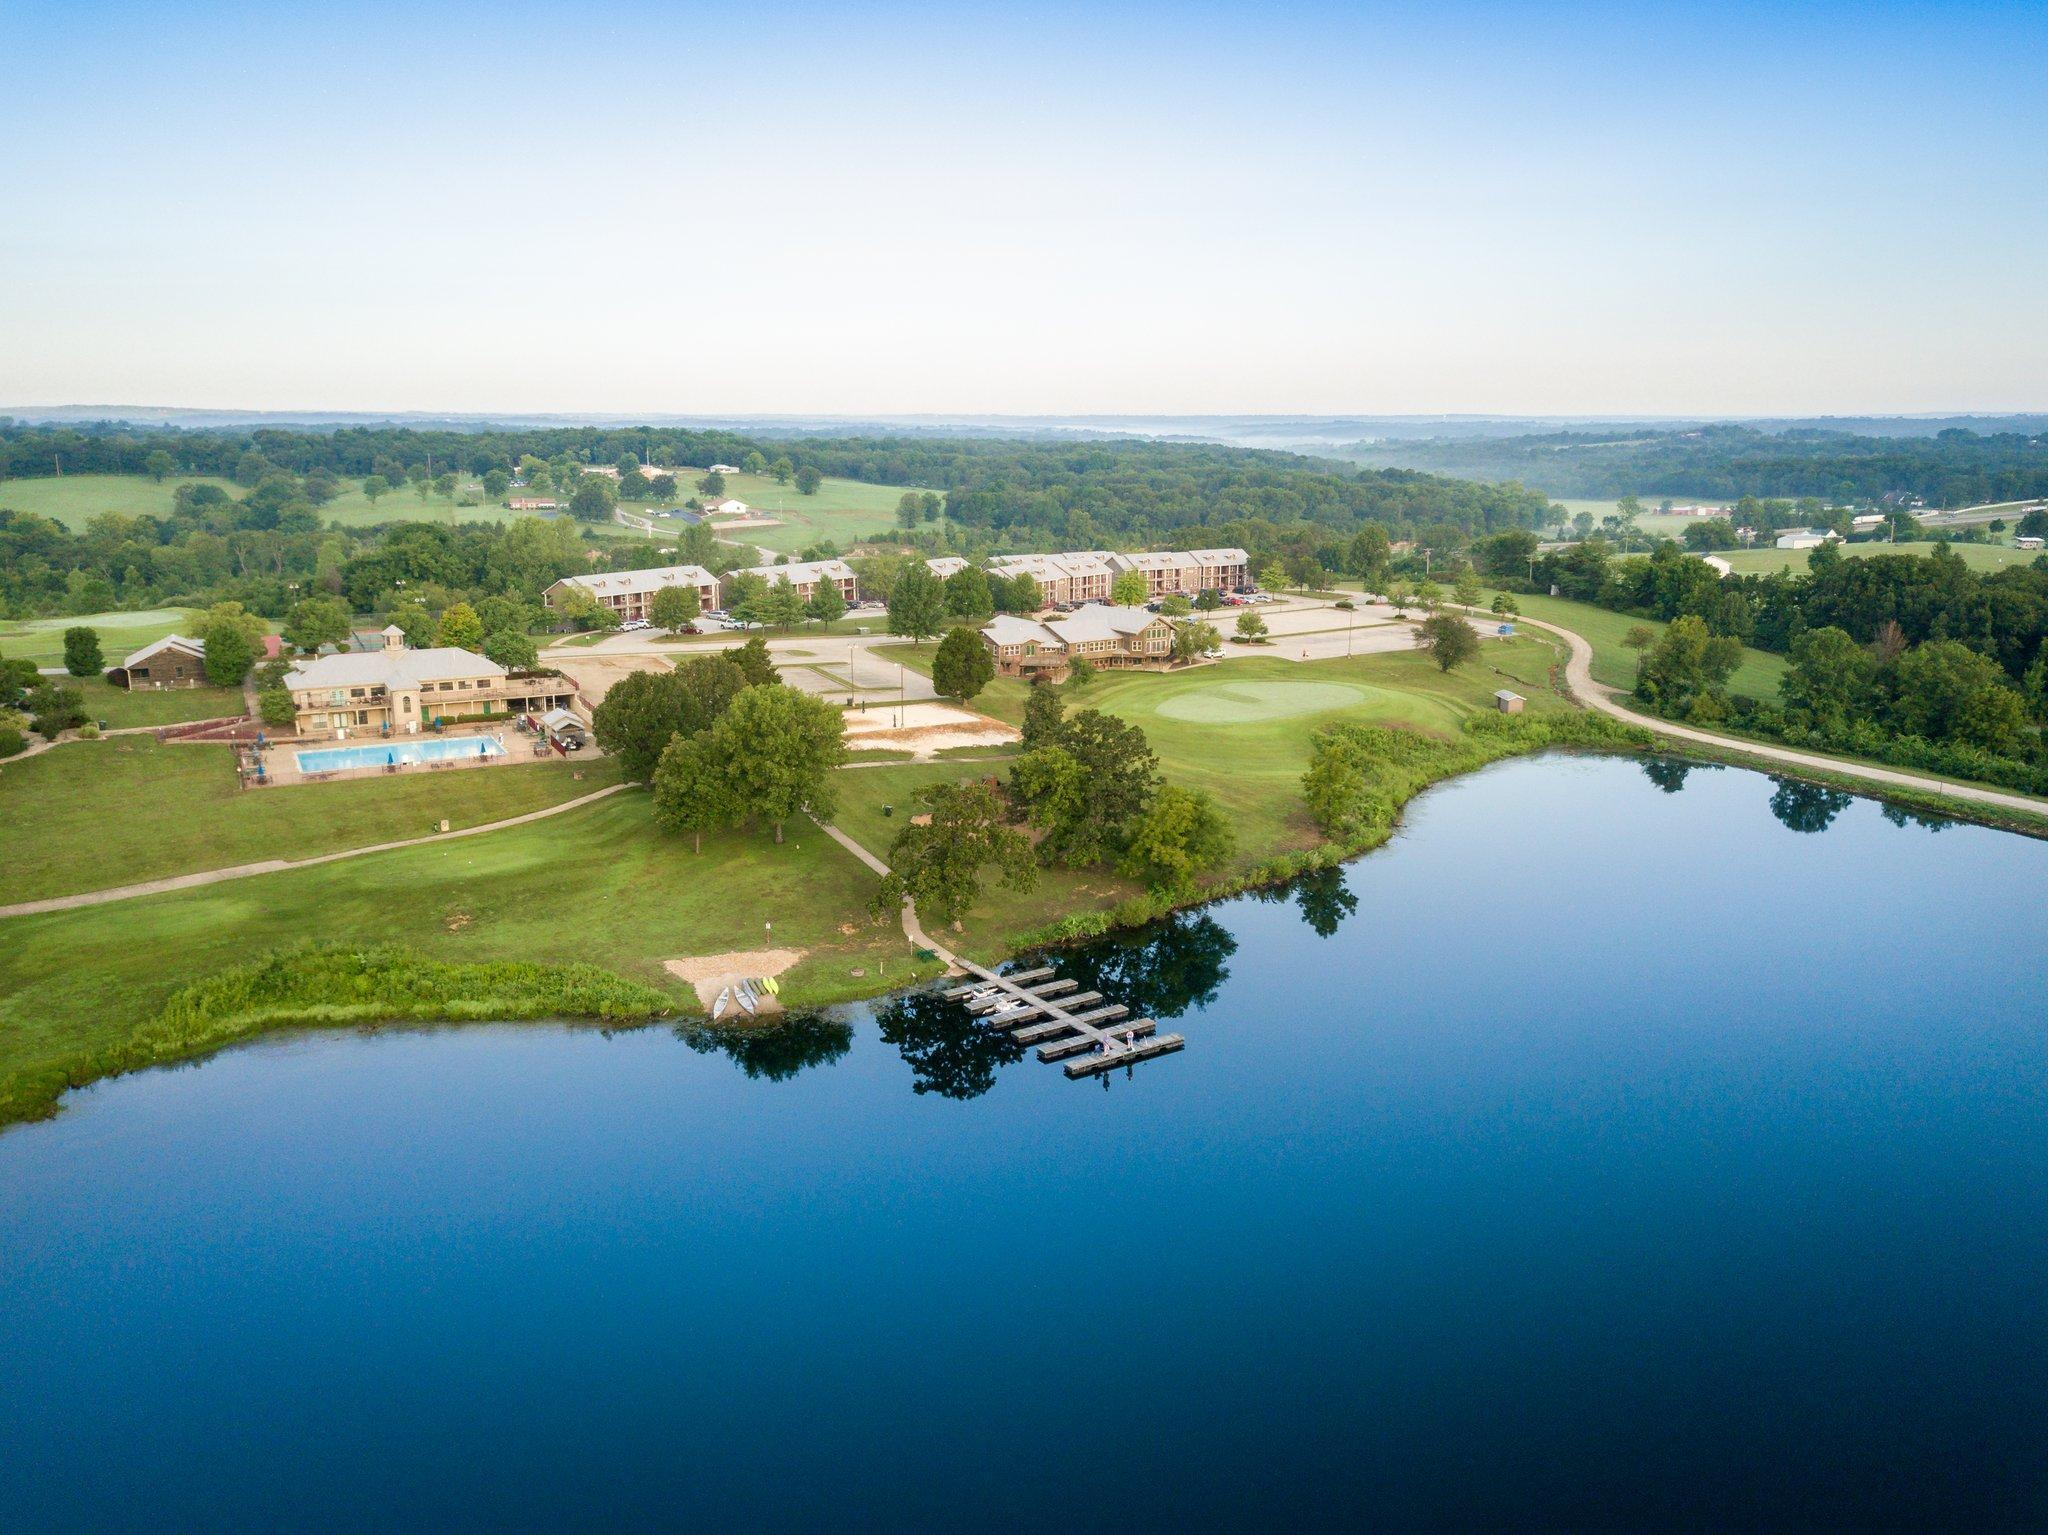 Holiday Inn Club Vacations Timber Creek Resort